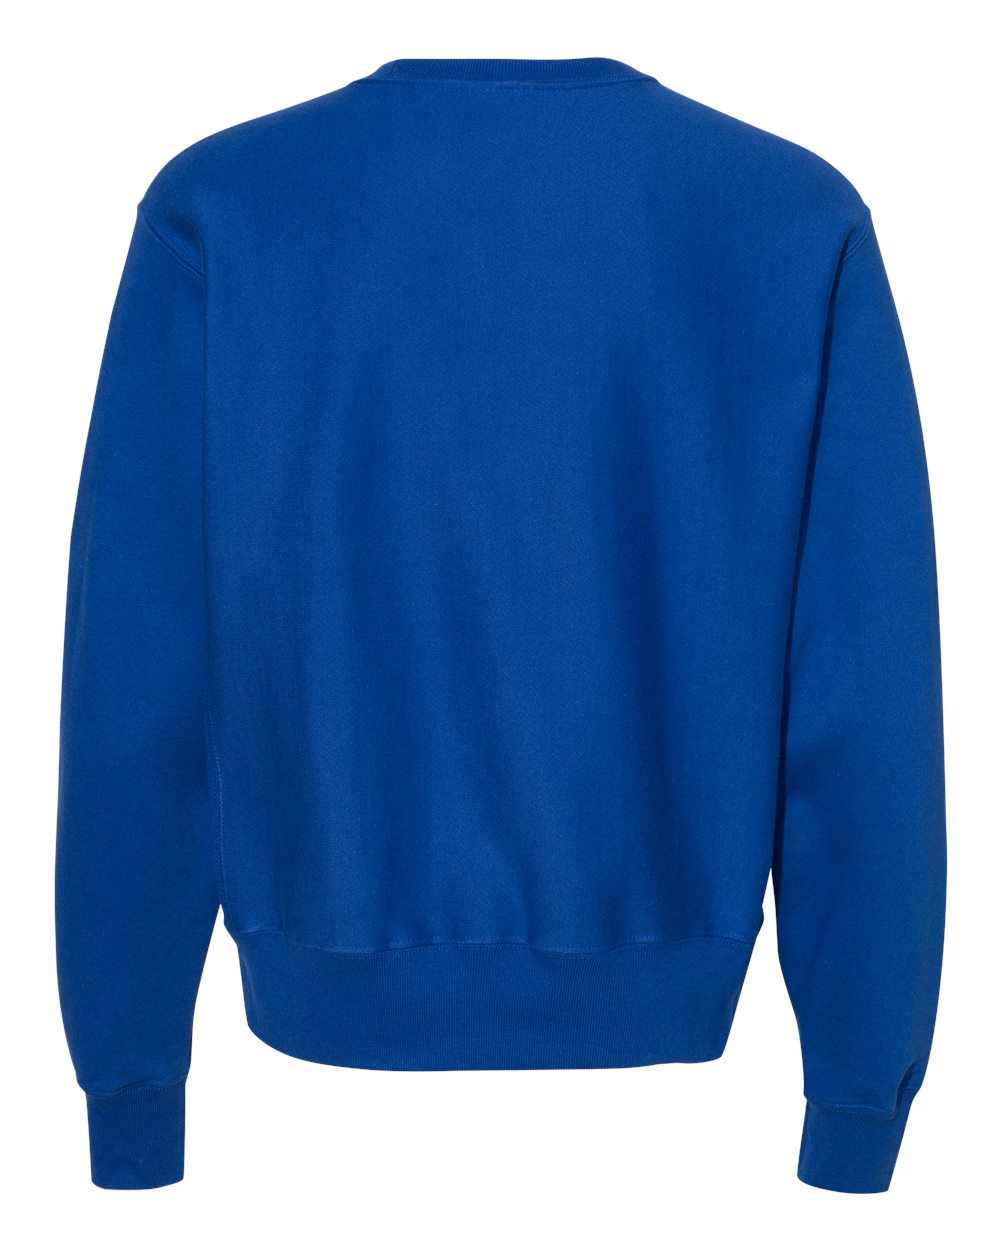 Champion-Mens-Reverse-Weave-Crewneck-Sweatshirt-Blank-Solid-S149-up-to-3XL thumbnail 7